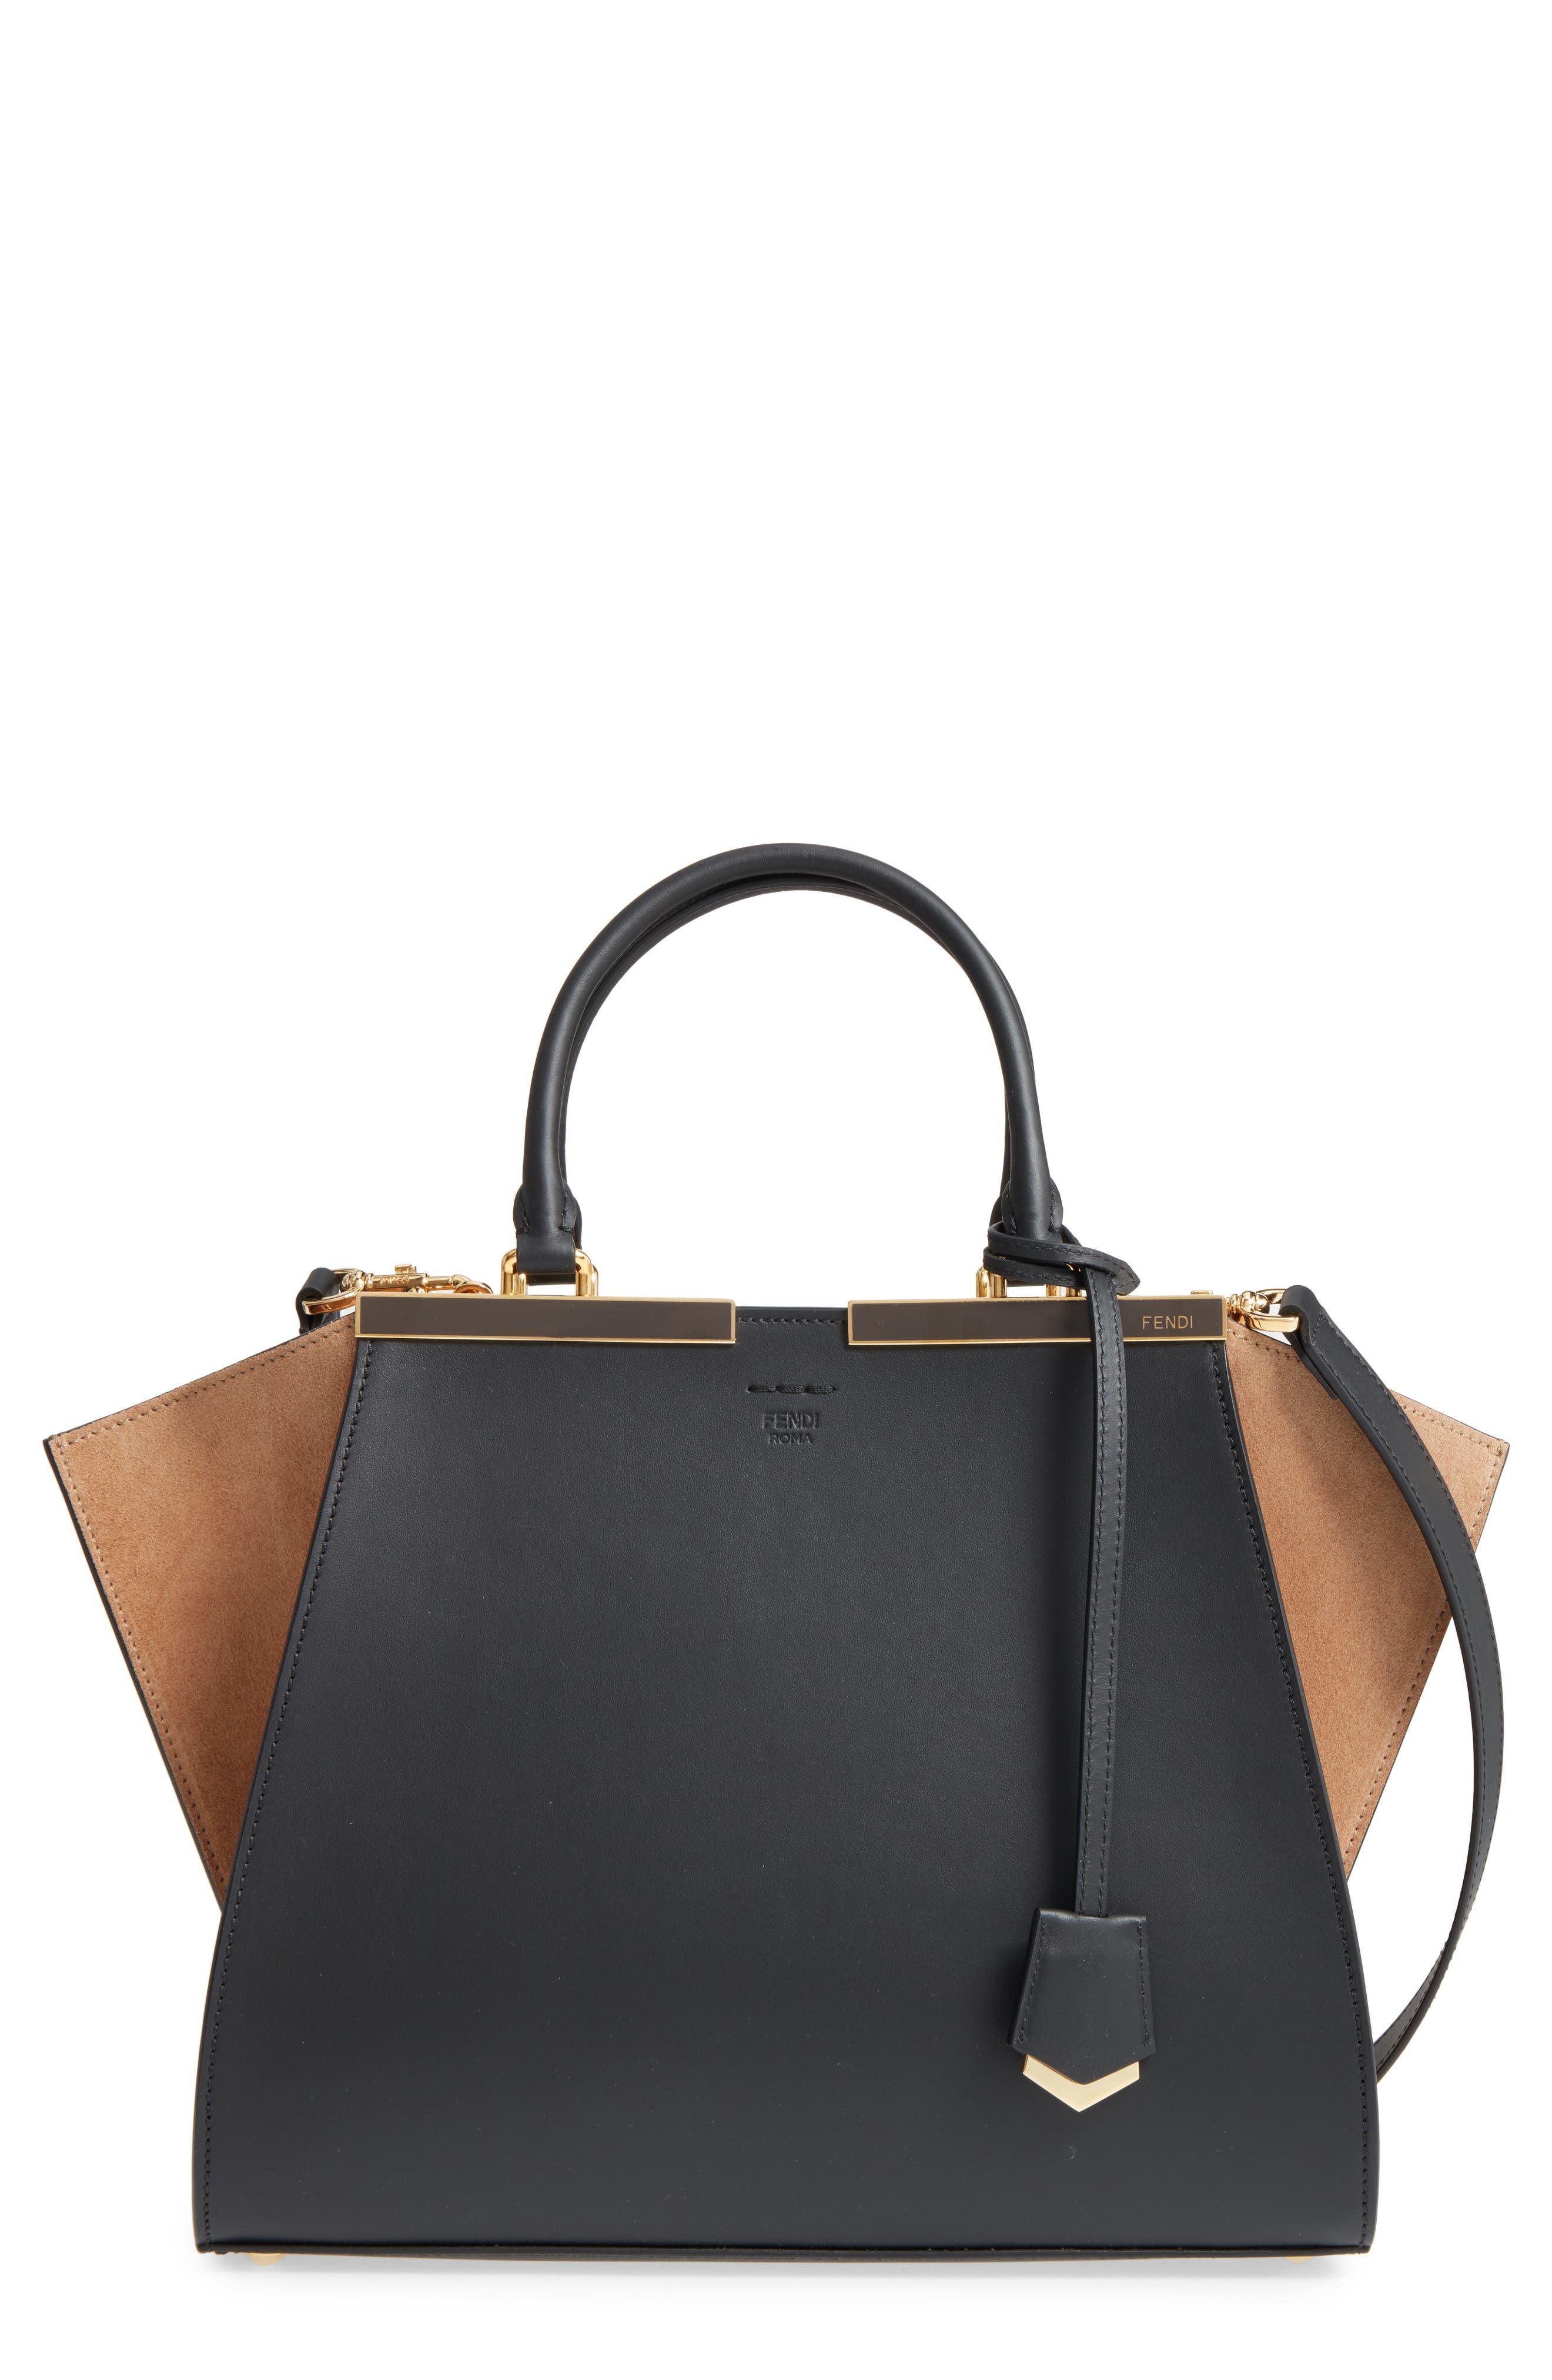 Fendi 3Jours Leather & Suede Shopper